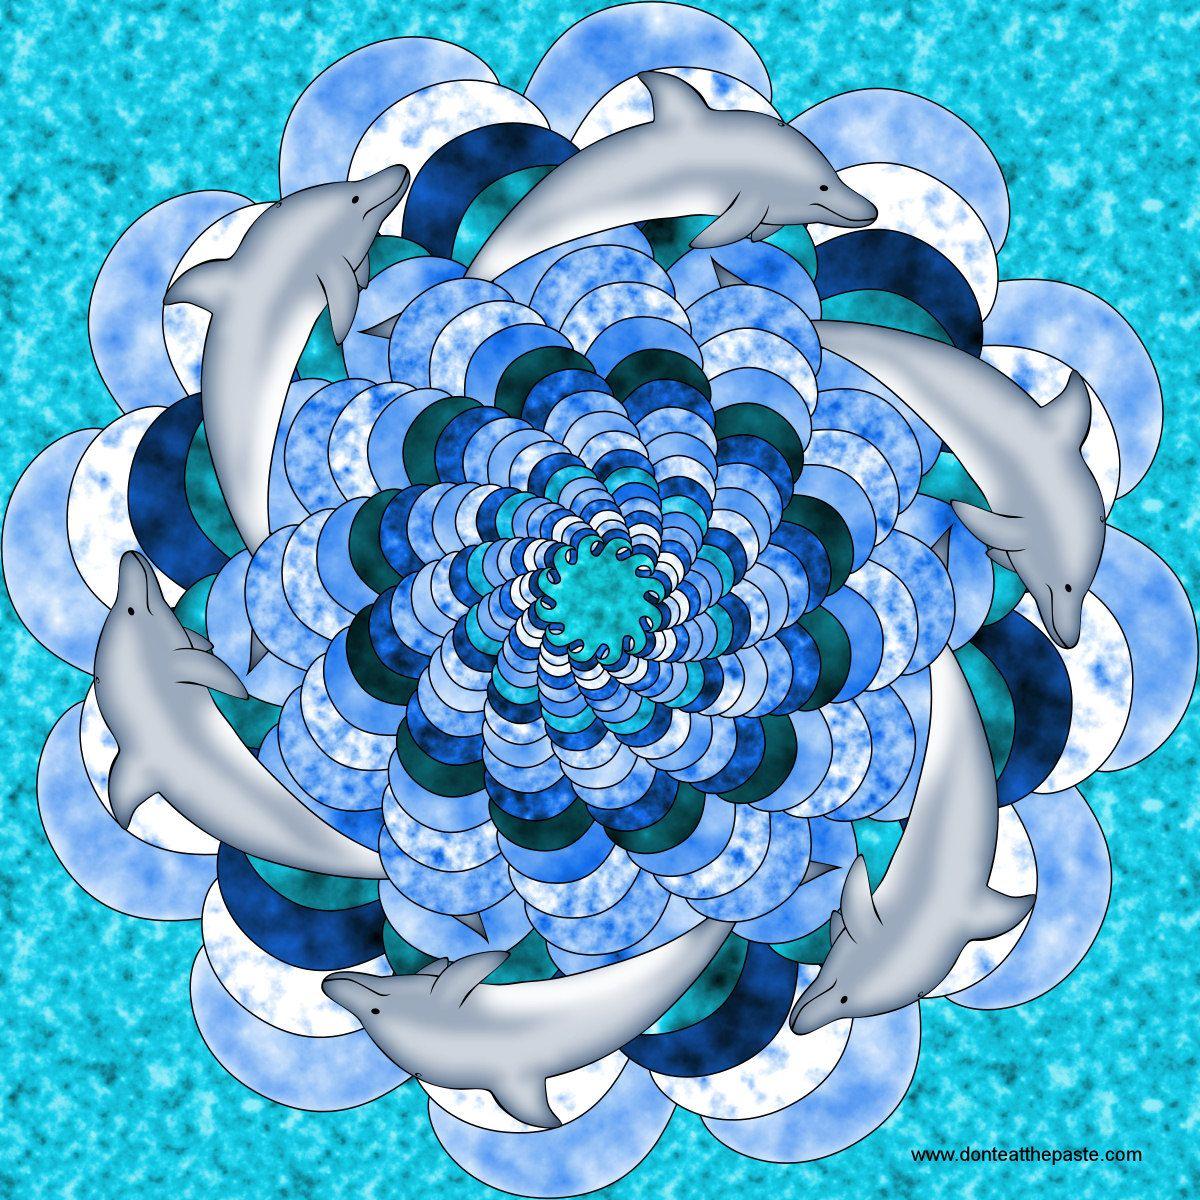 Dolphin Mandala to Color Mandalas